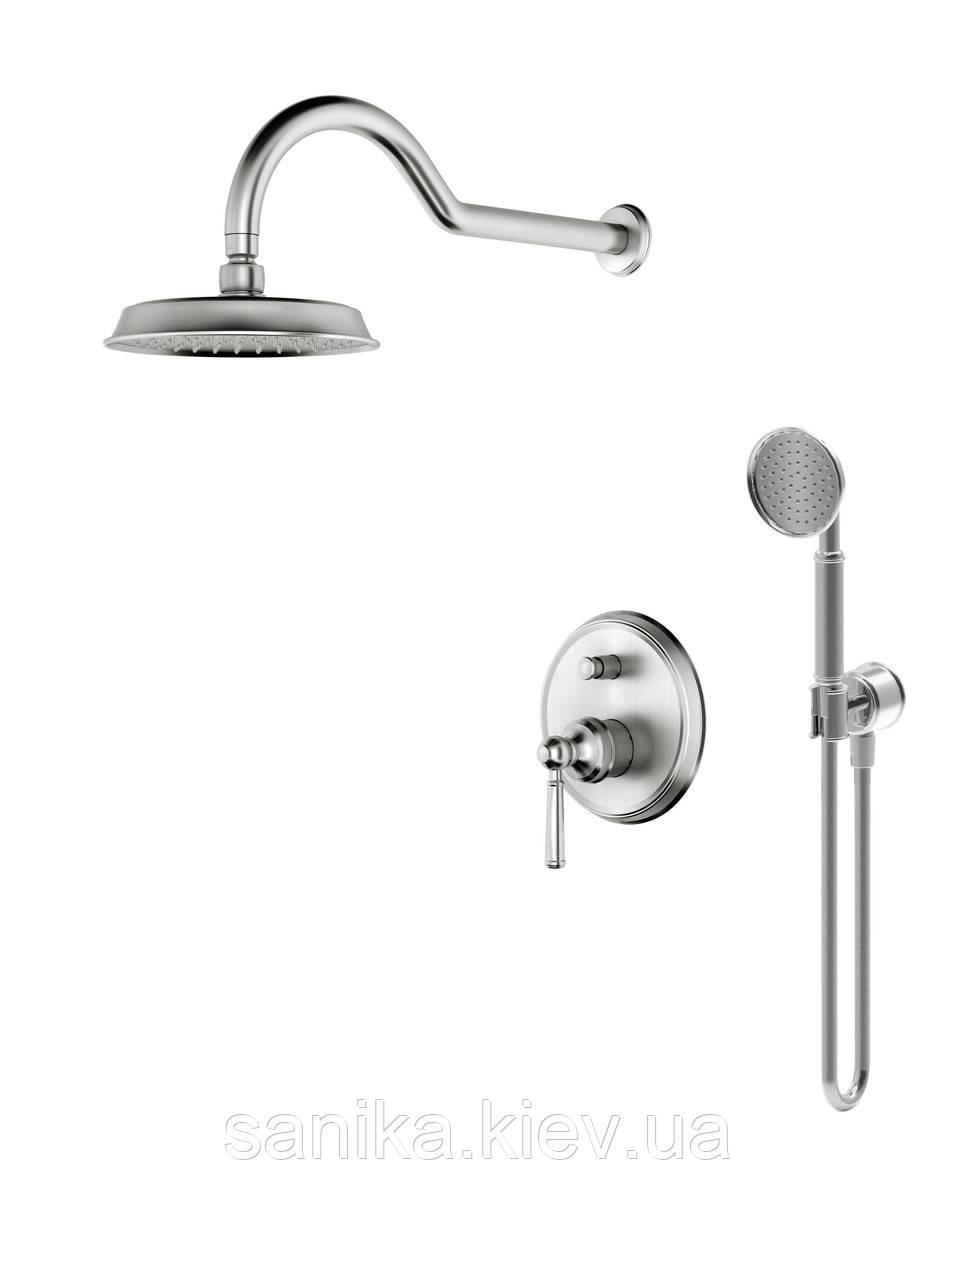 Комплект для душа скрытого монтажа IMPRESE HYDRANT (смес.скрытого монтажа, верхн.душ,ручной душ)